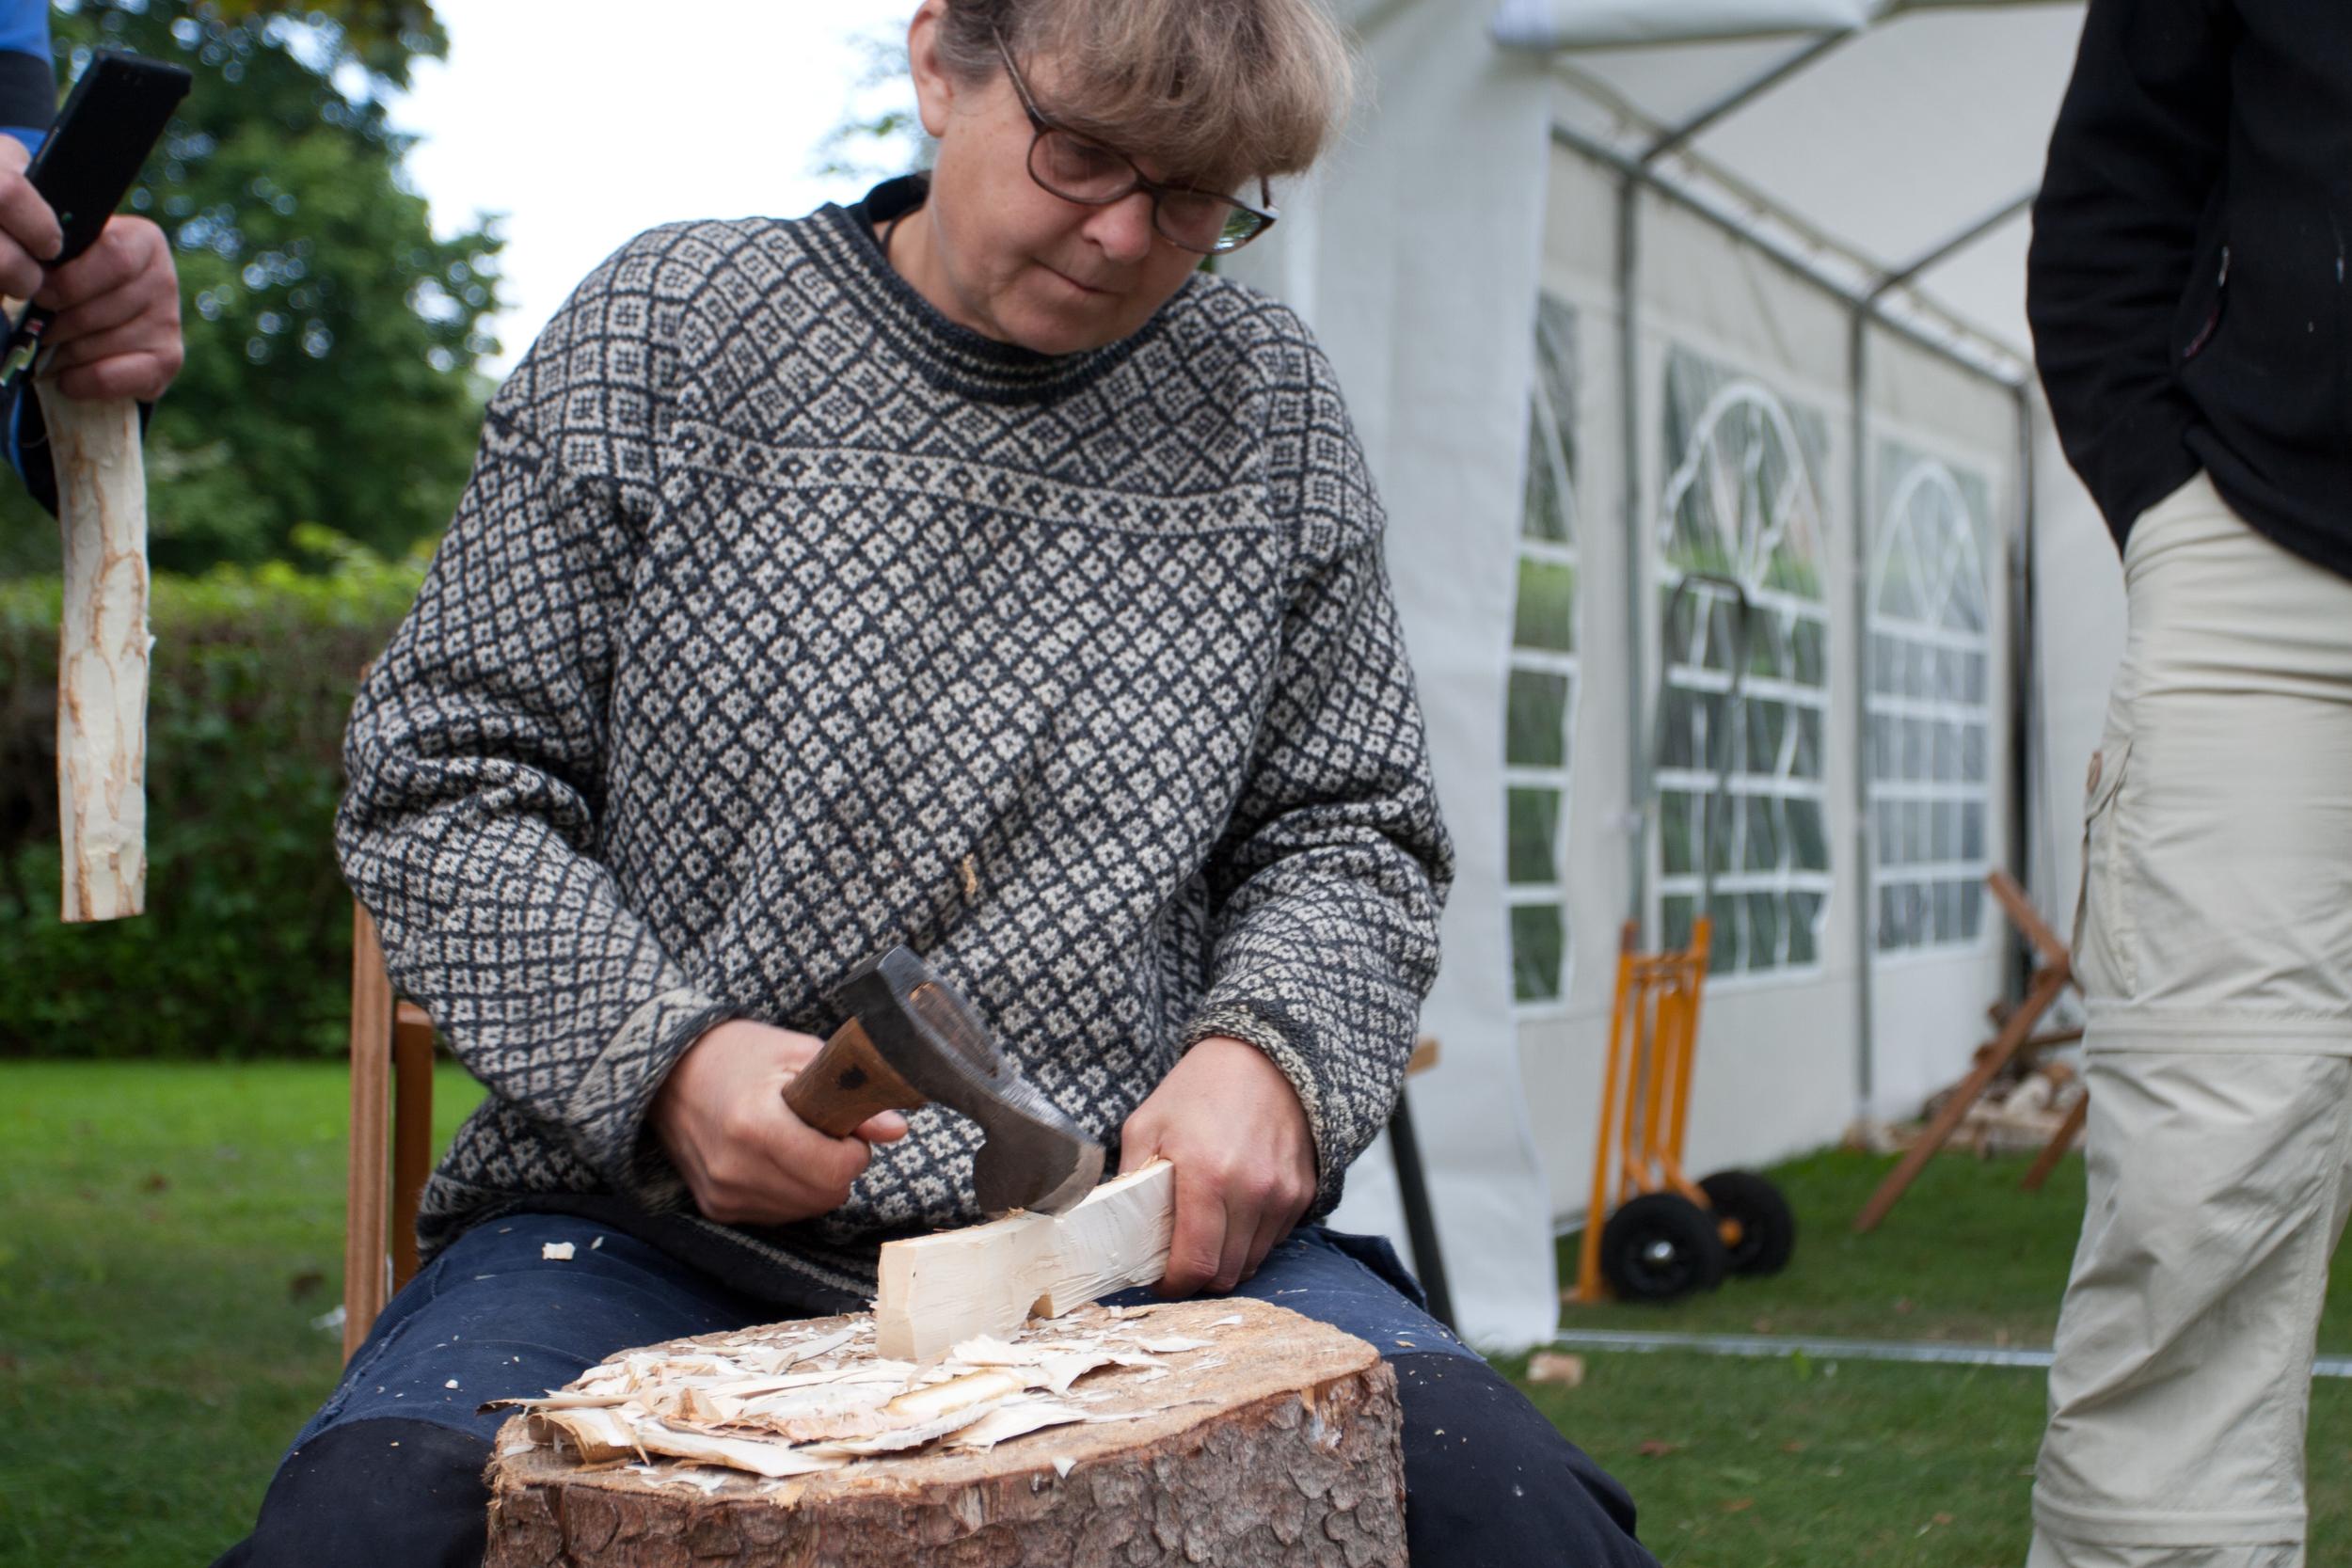 Beth Moen teaching spoon carving at Taljfest 2014